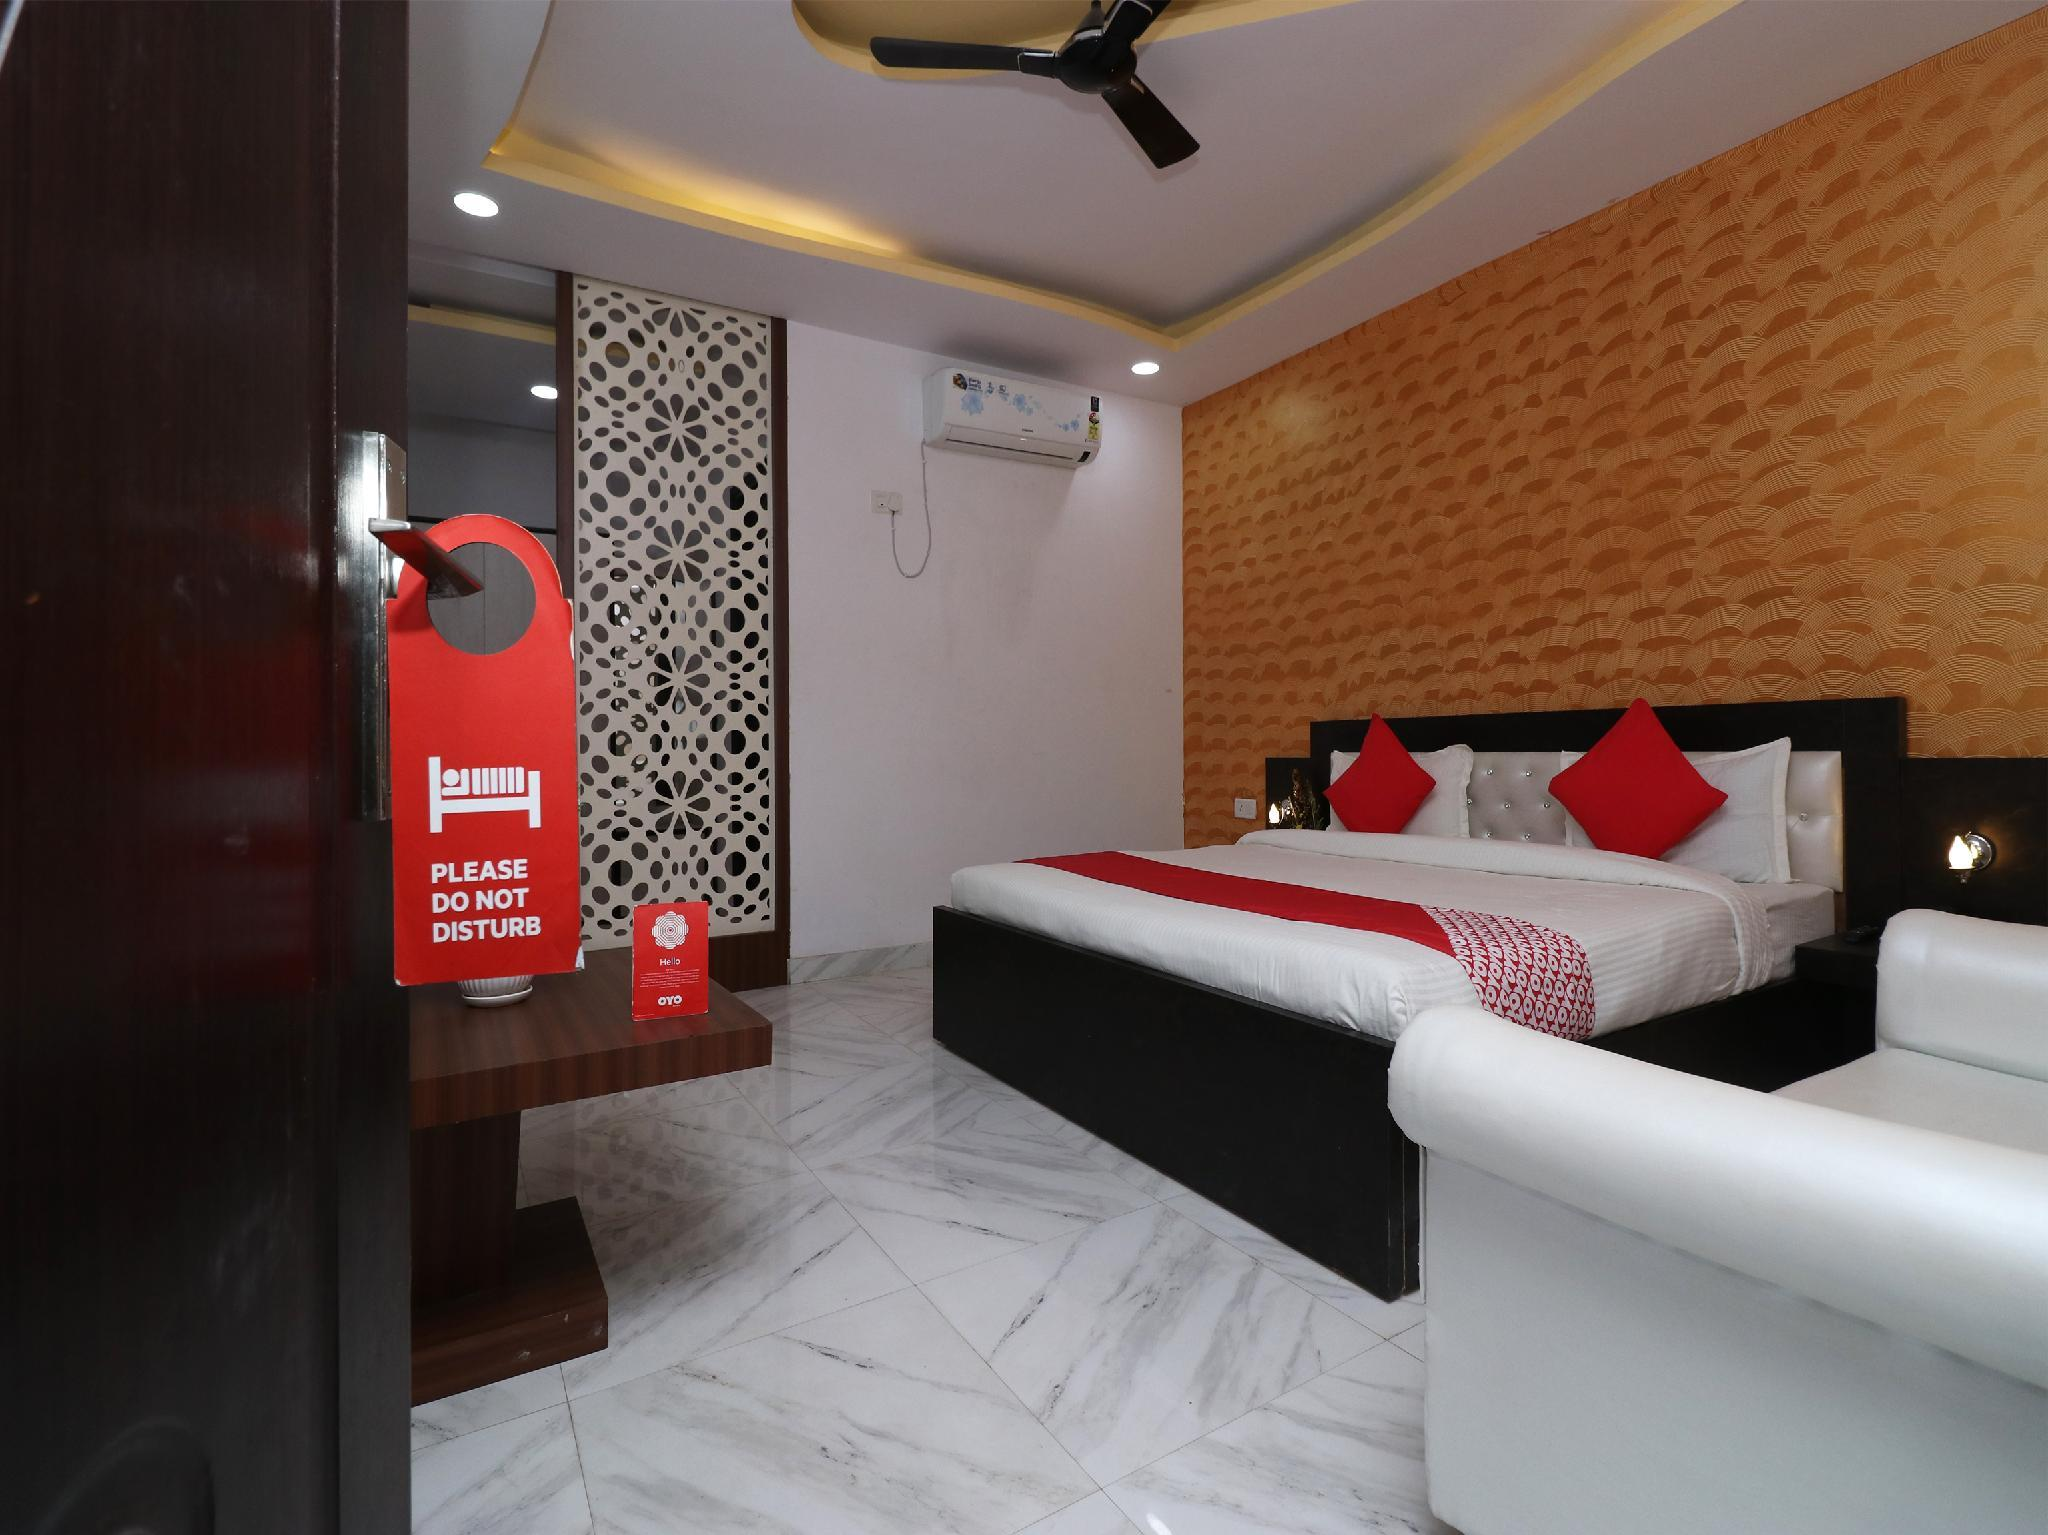 OYO 35396 Hotel Mj Palace, Barabanki